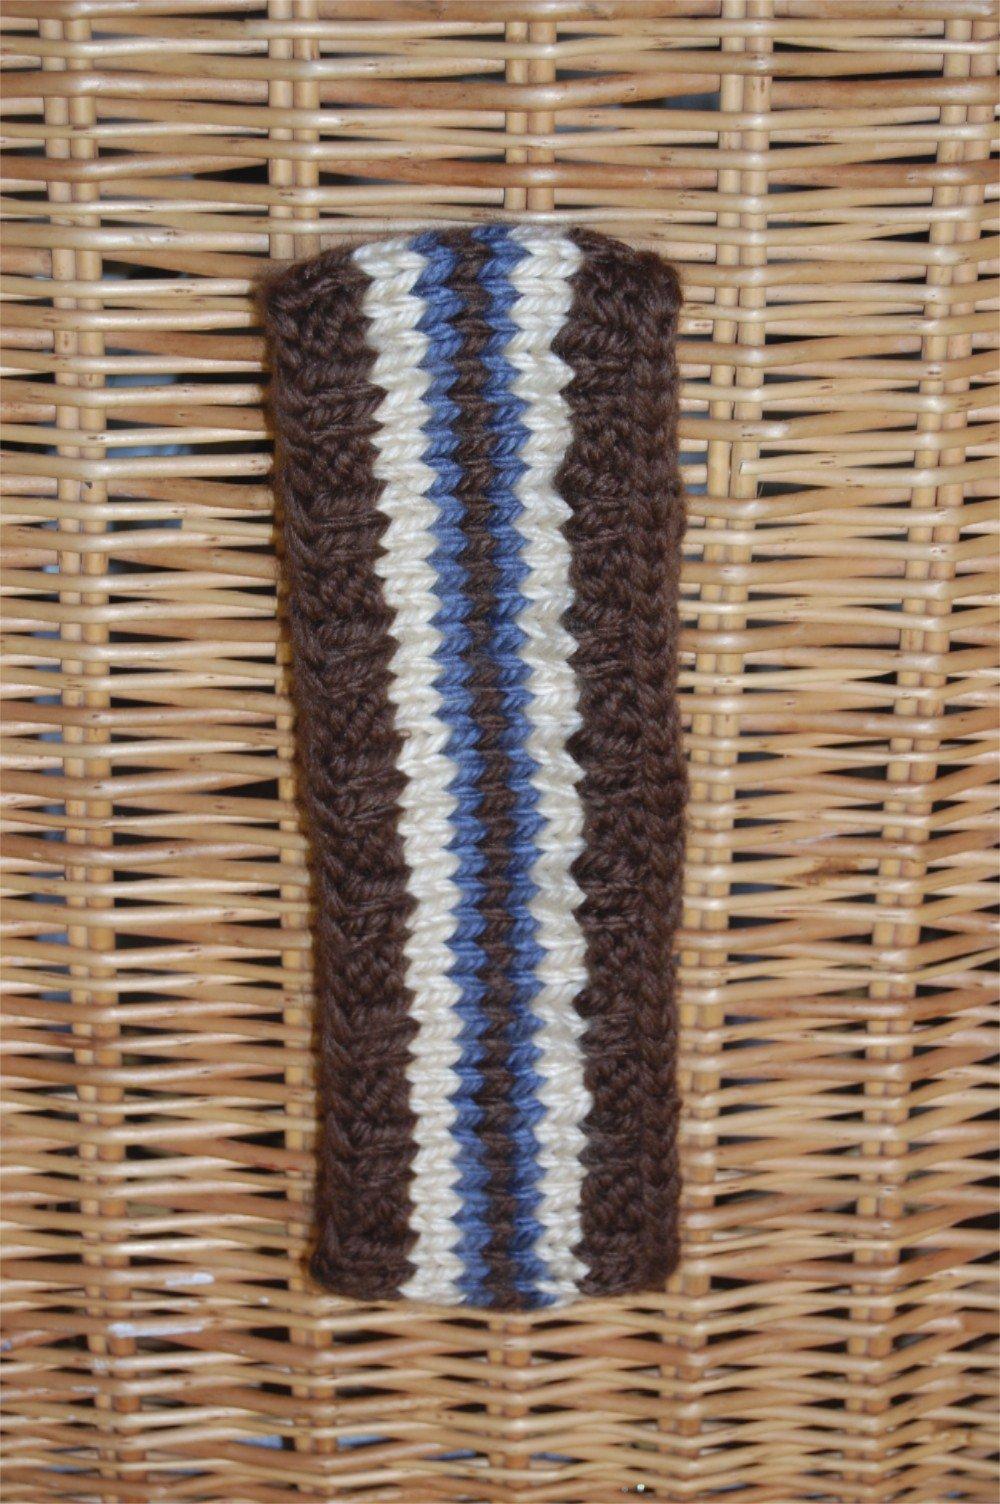 THICK YARN (Brown, beige, blue)